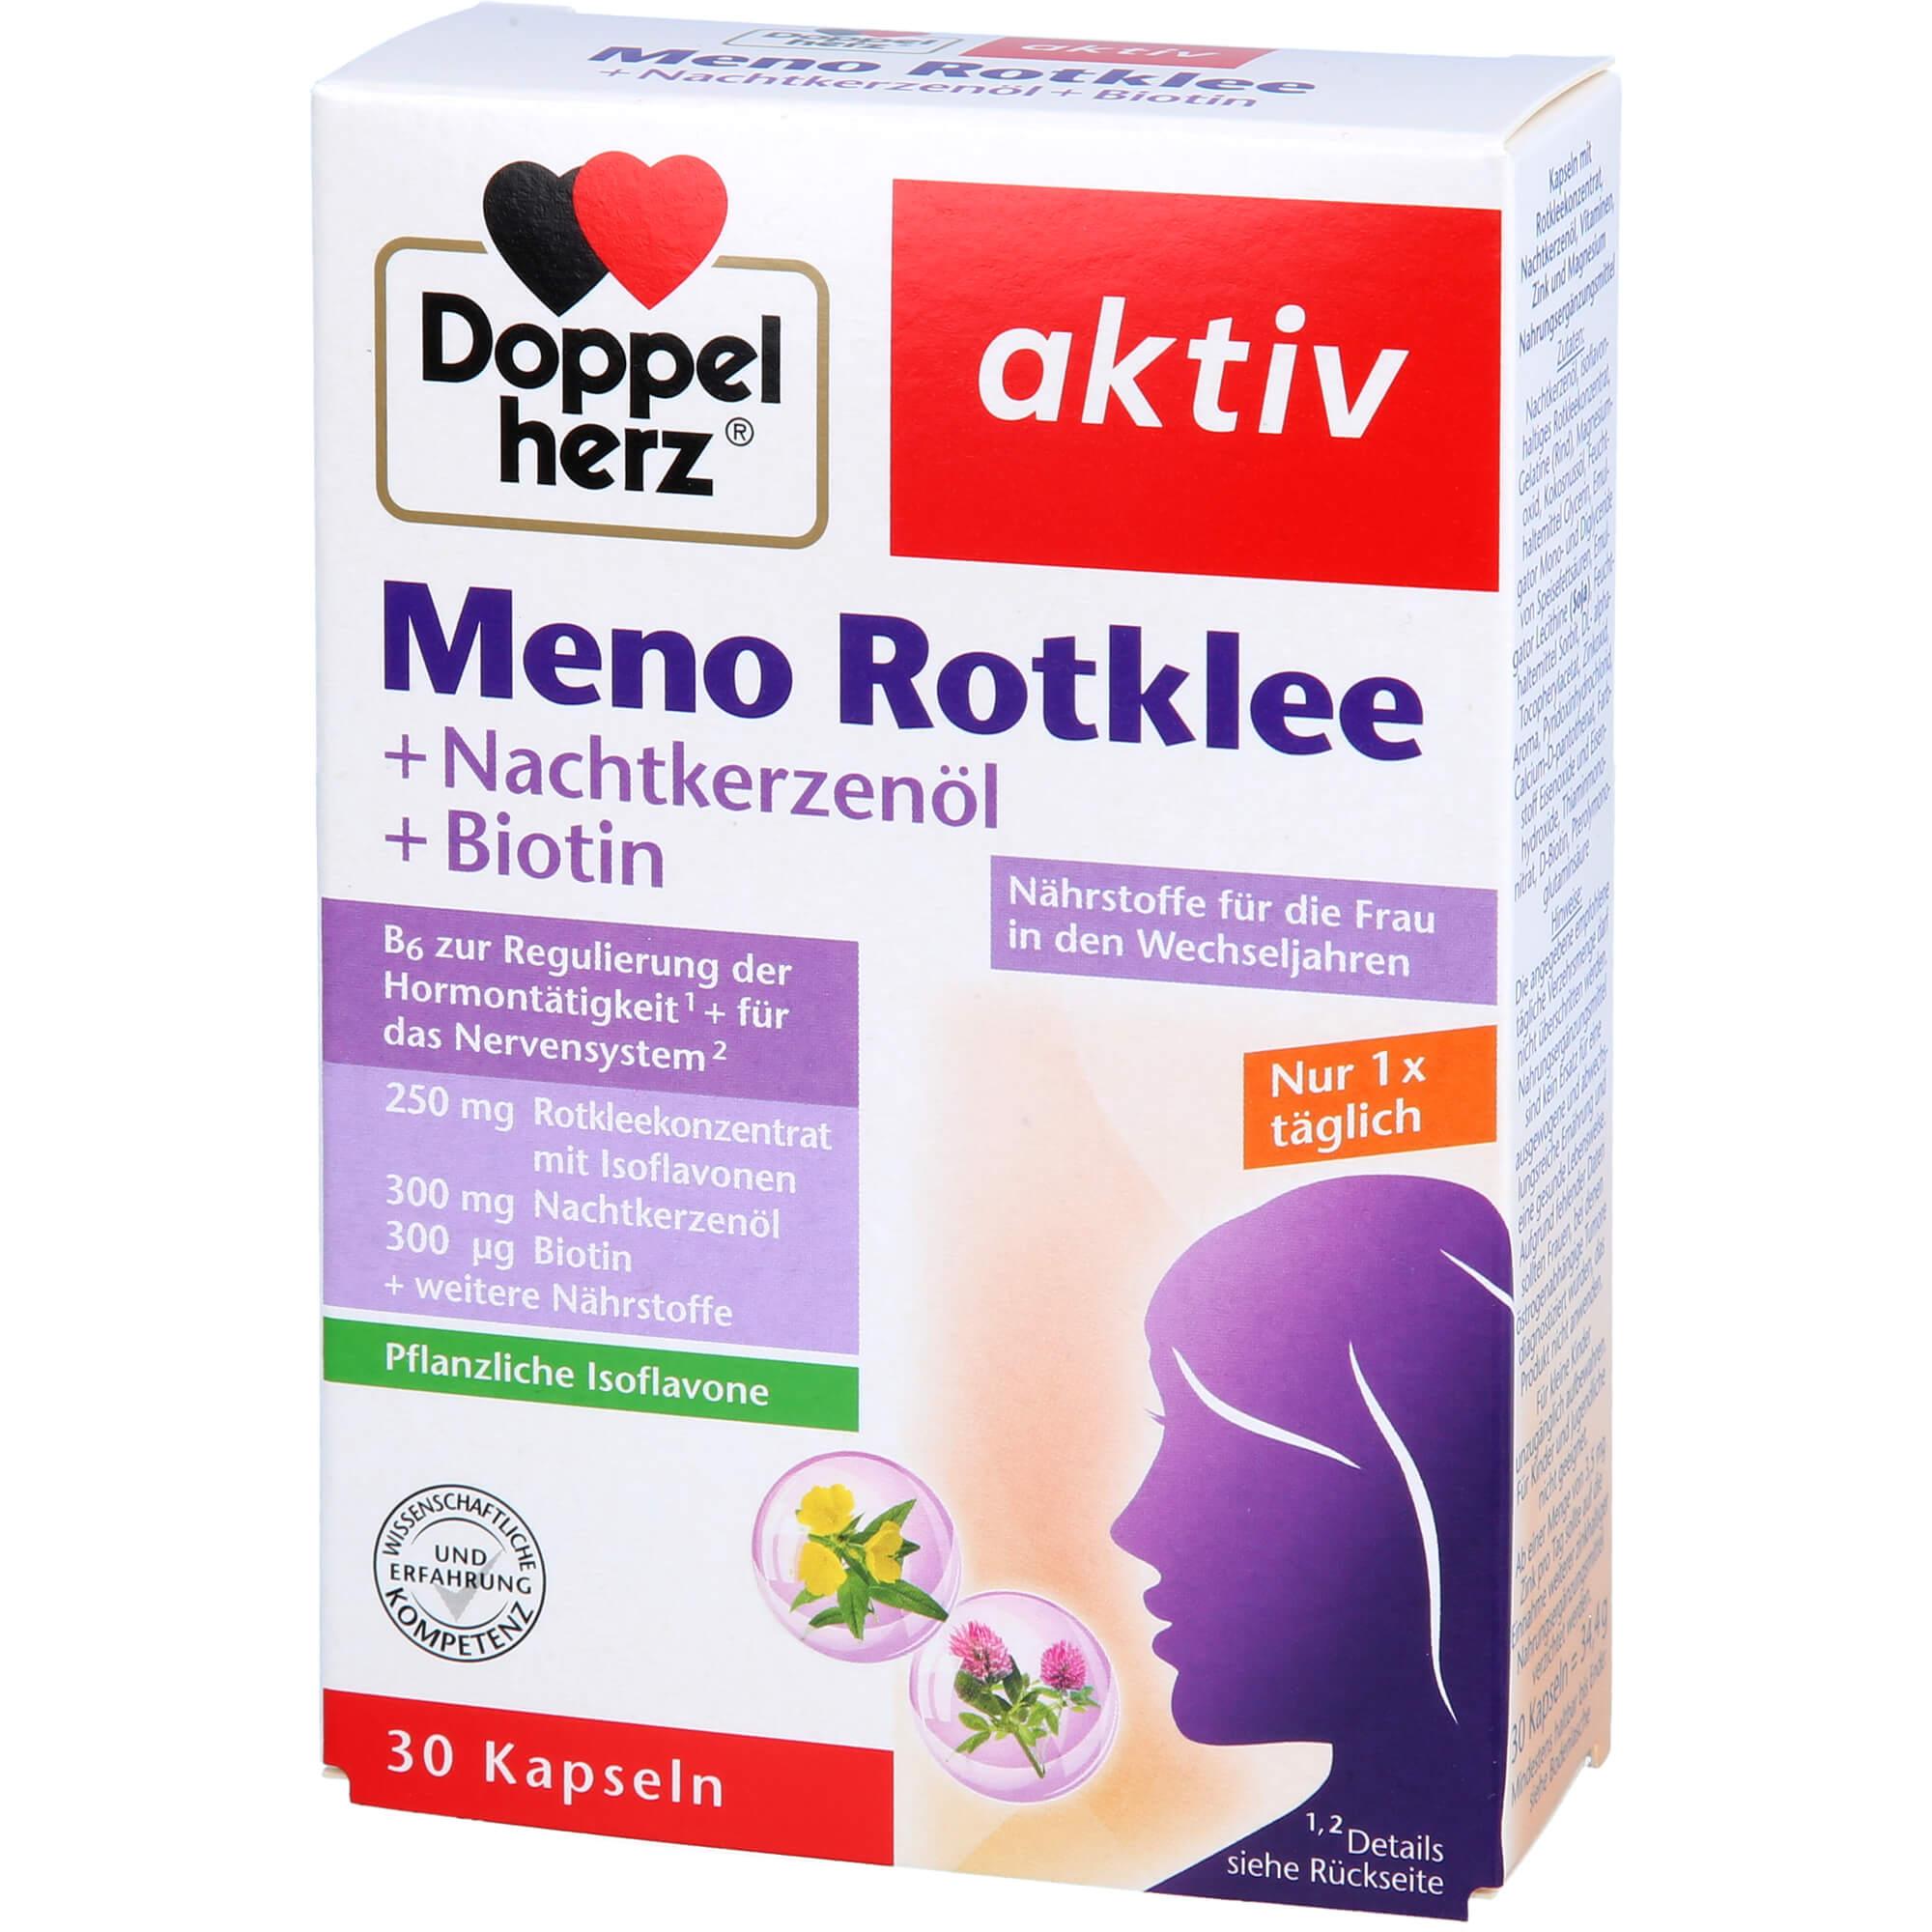 DOPPELHERZ Meno Rotklee+Nachtkerzenöl+Biotin Kaps.